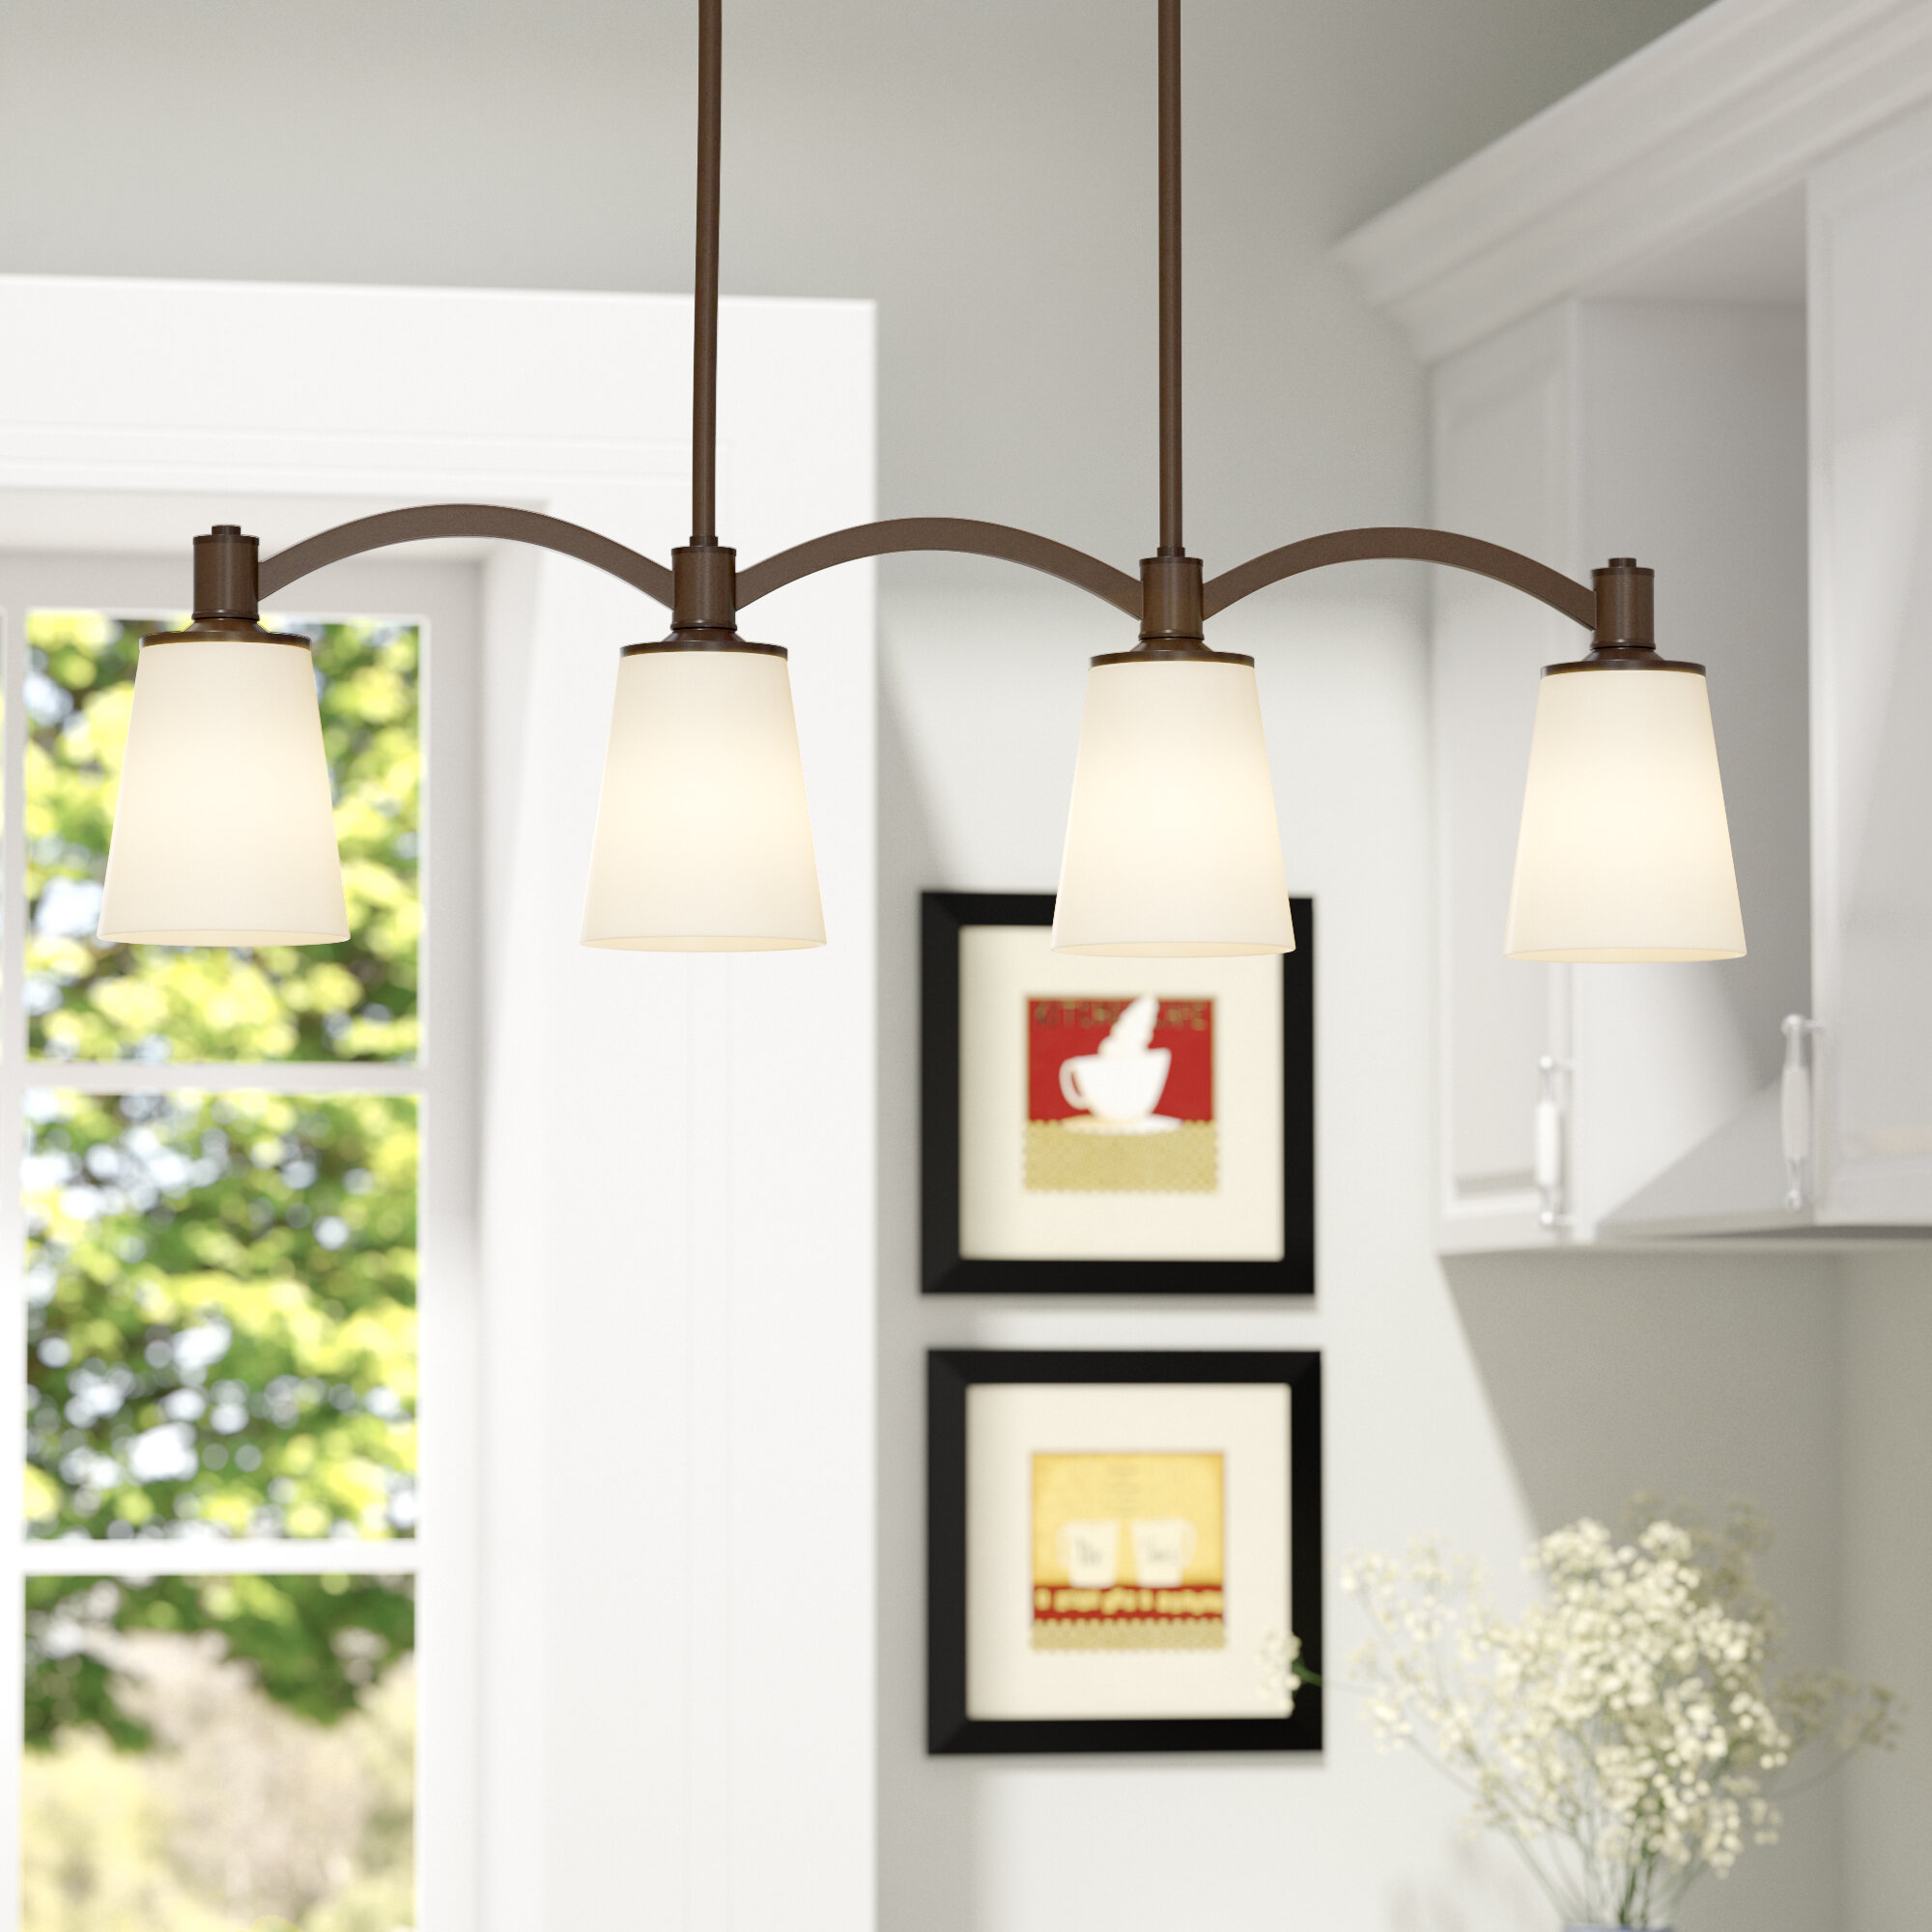 Kitchen Island Lighting Youll Love Wayfair Extraordinary Pendant Light Wiring Kit Pics Decoration Inspiration Quickview